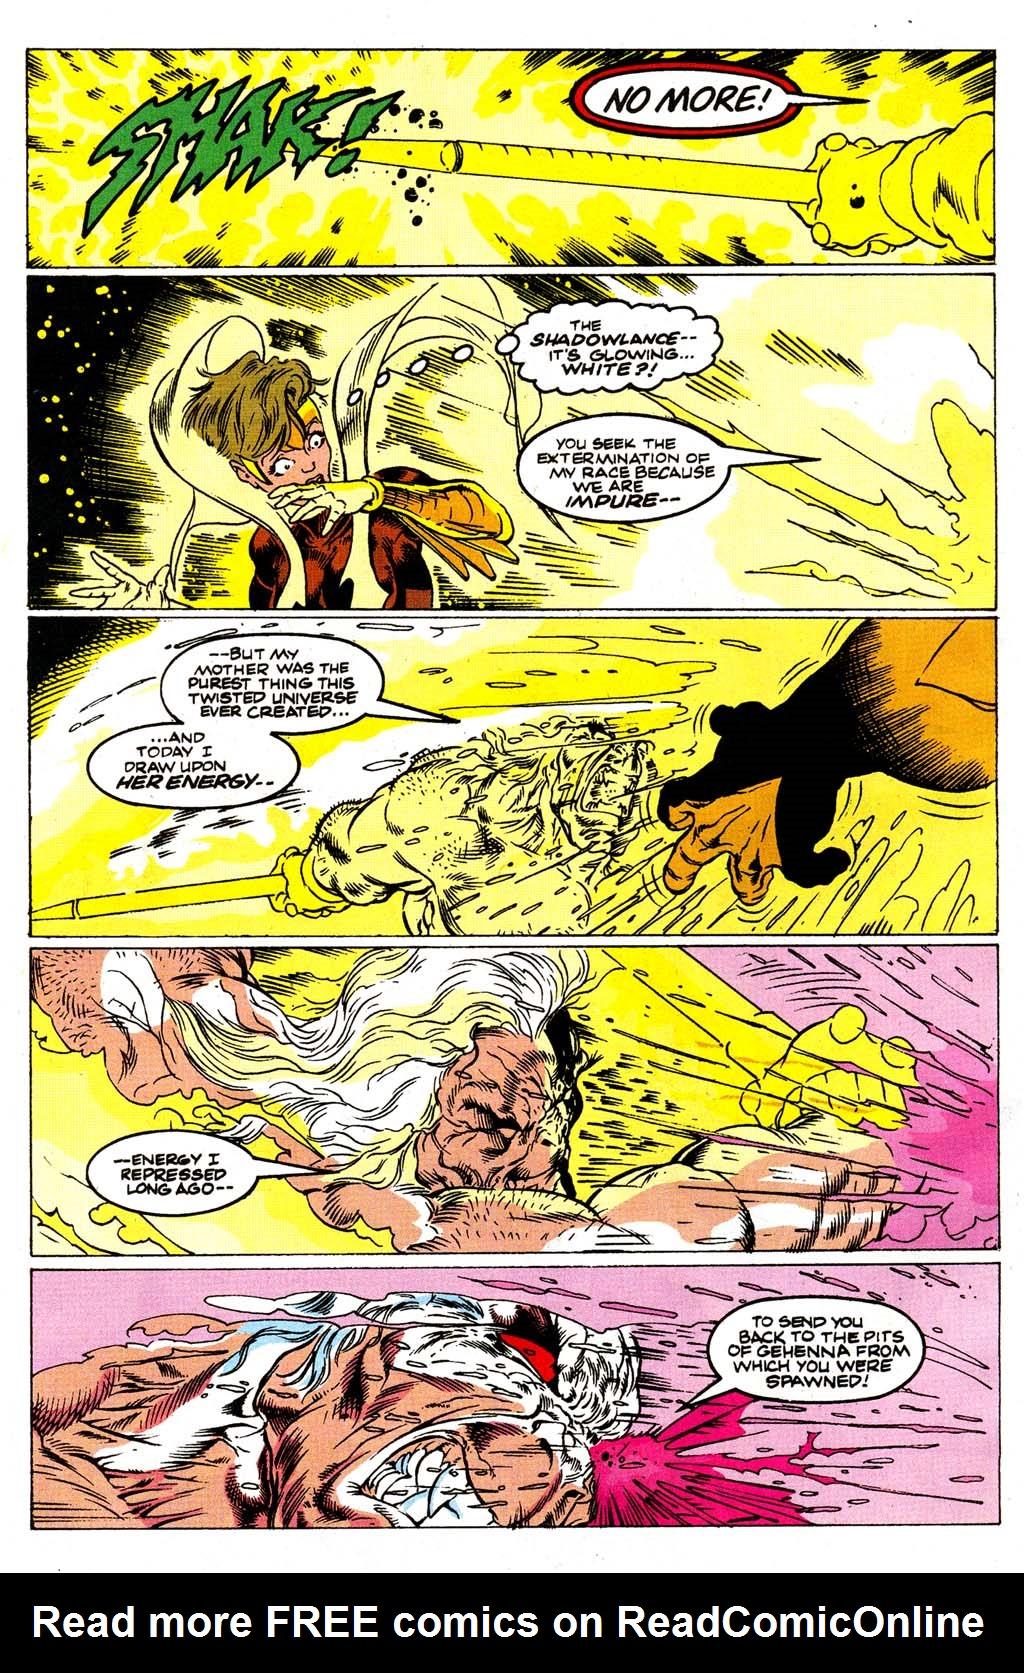 Read online Blackwulf comic -  Issue #9 - 20